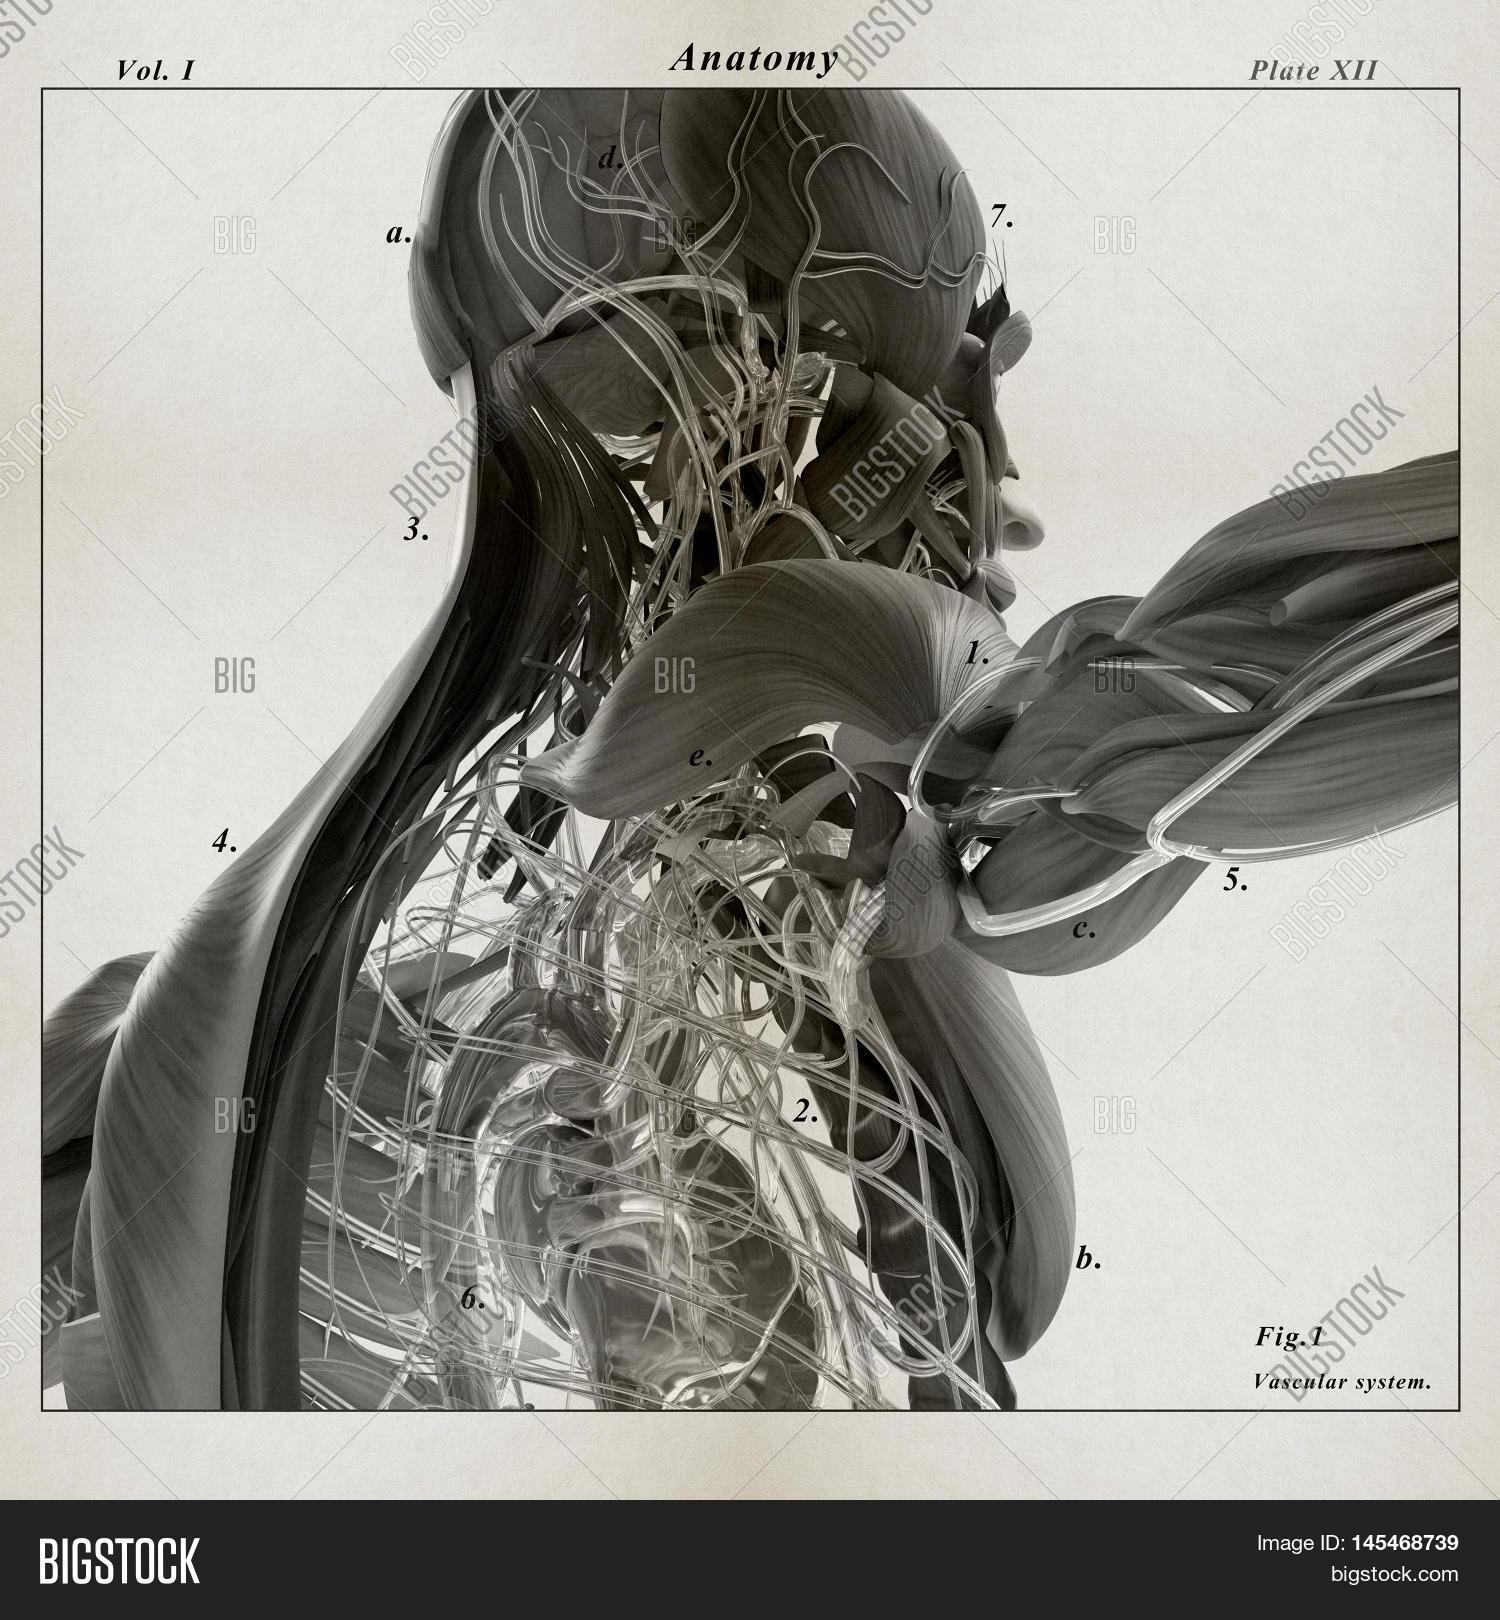 Human Anatomy 3d Image Photo Free Trial Bigstock